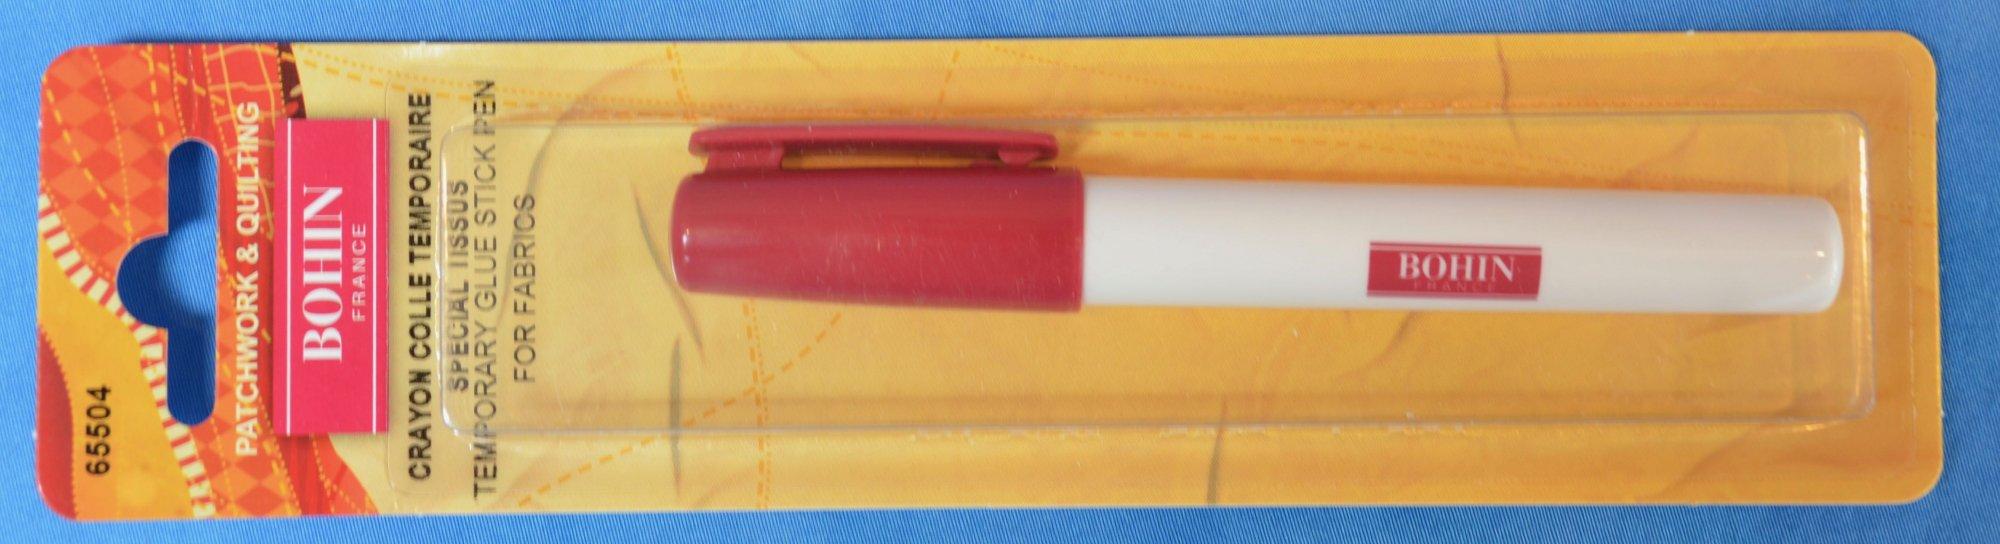 Bohin Glue Pen